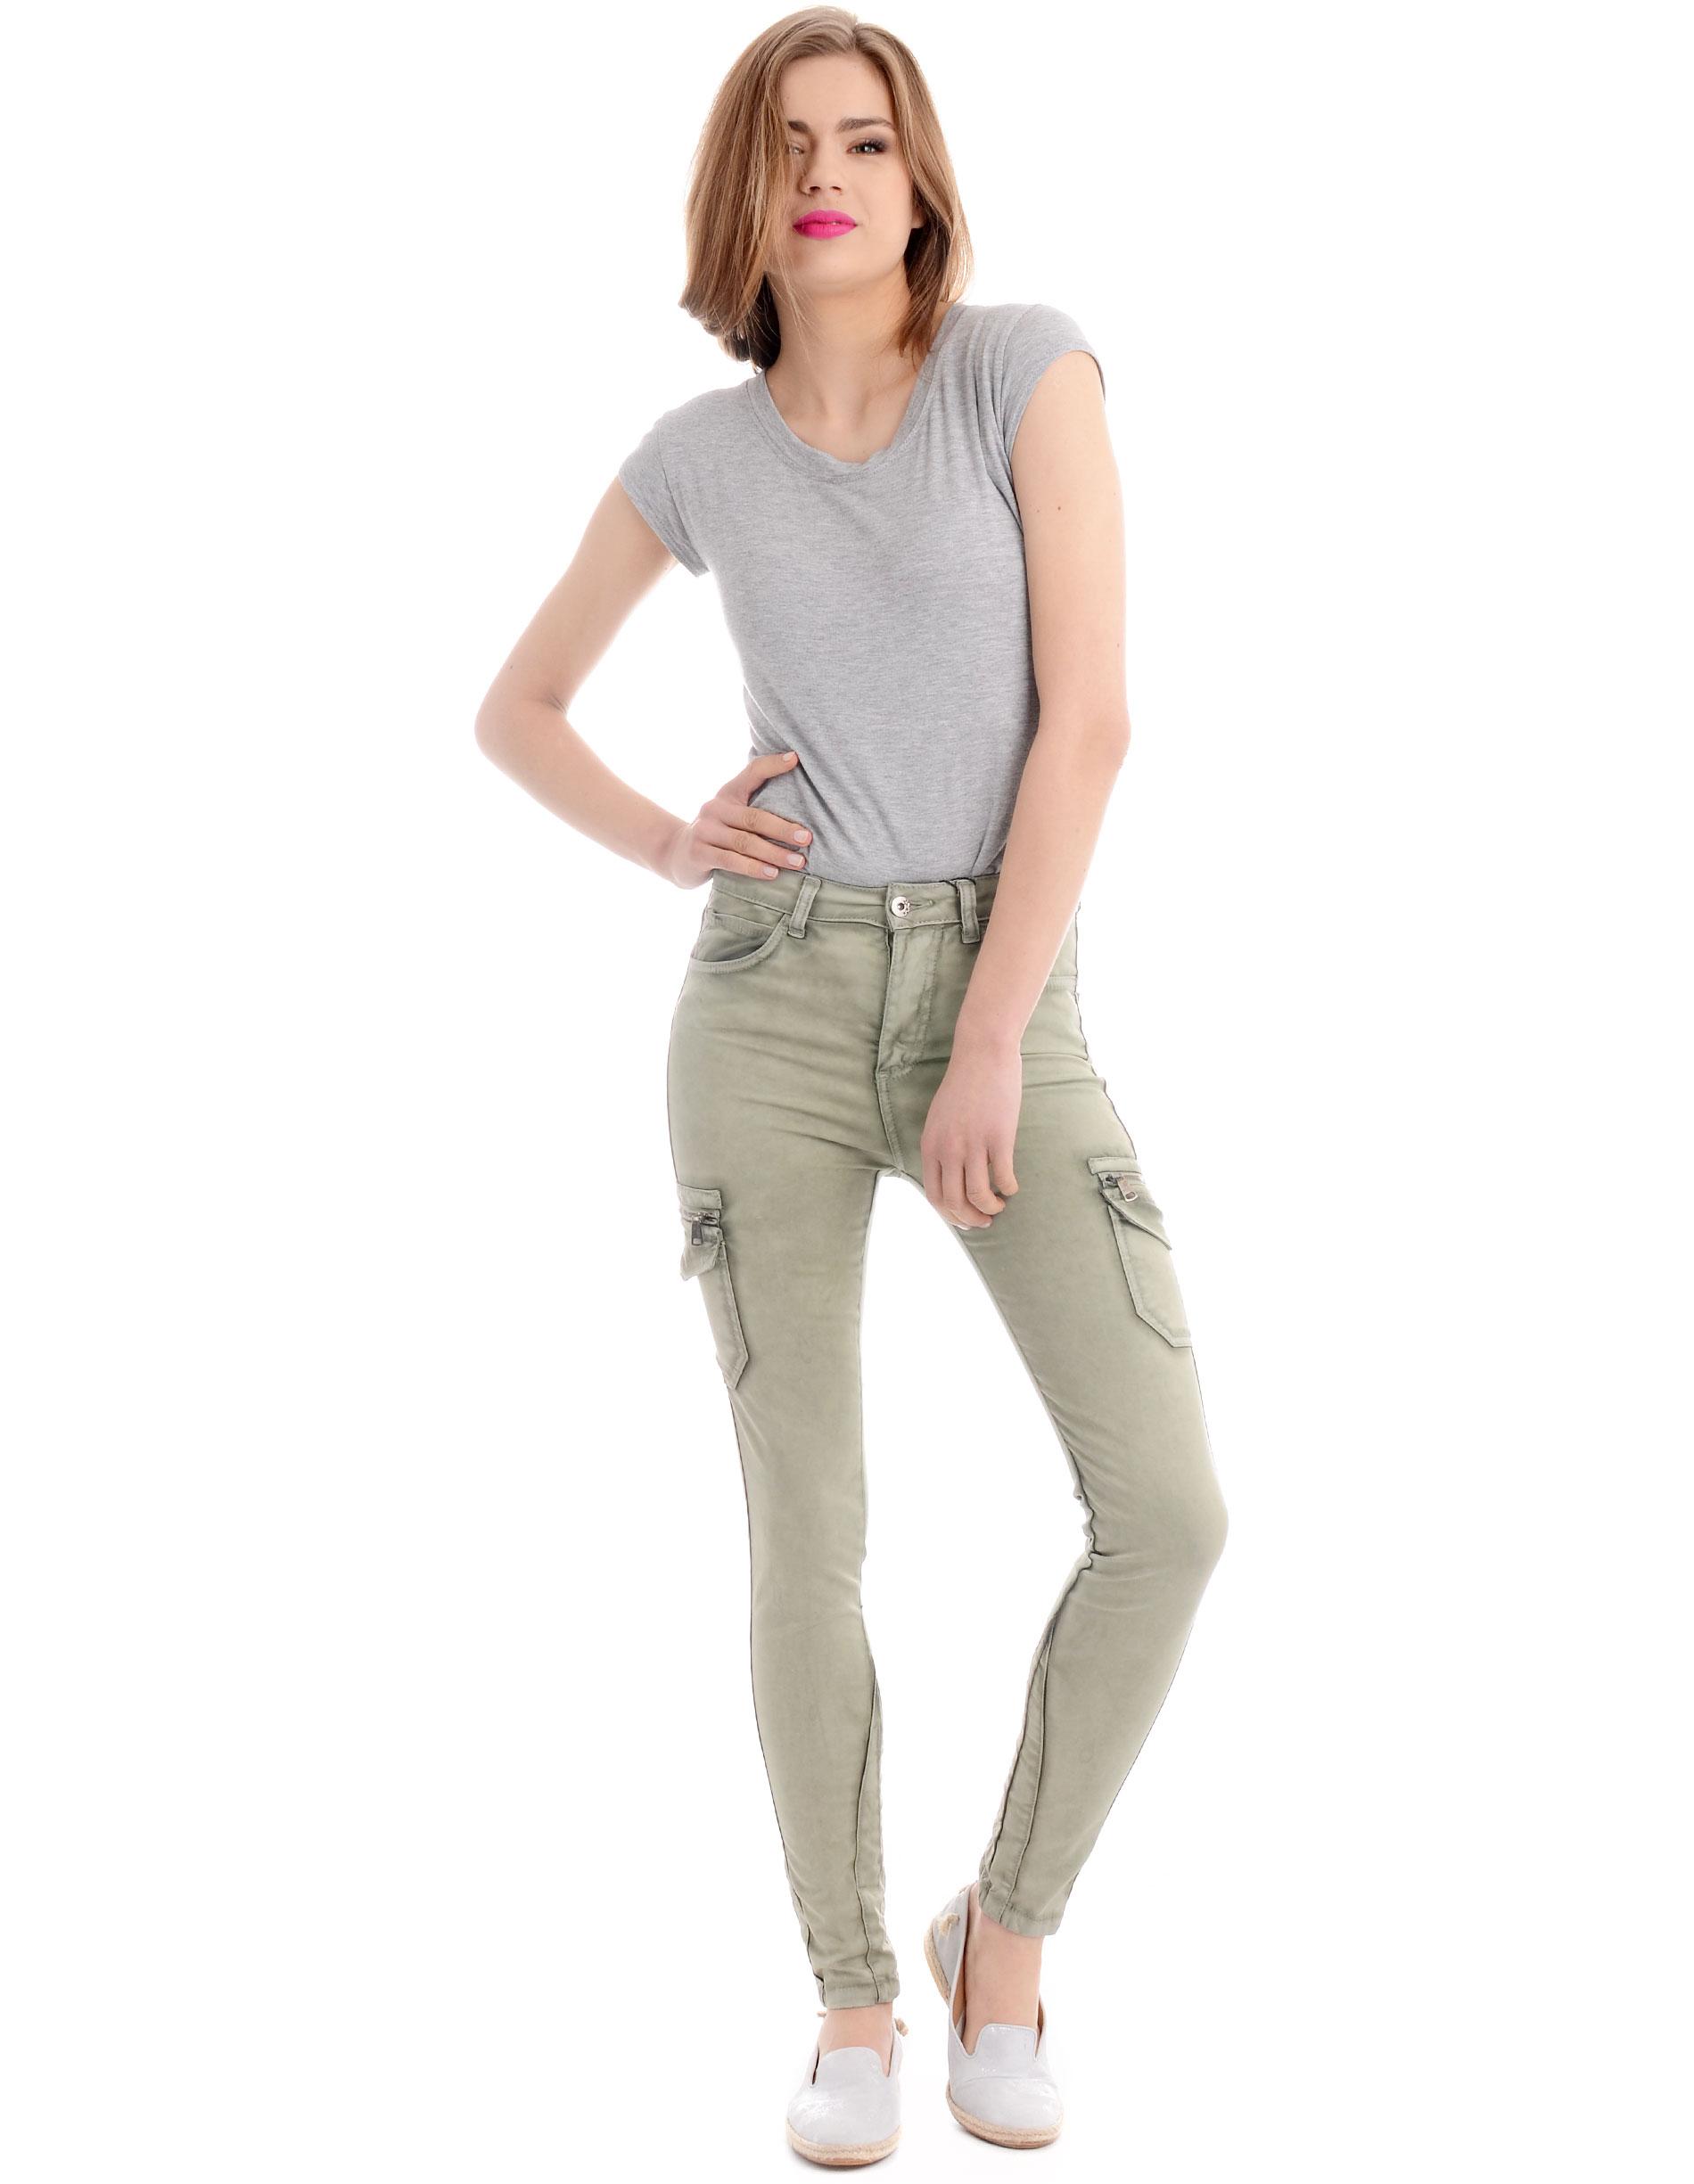 Spodnie - 102-1018 MILI - Unisono